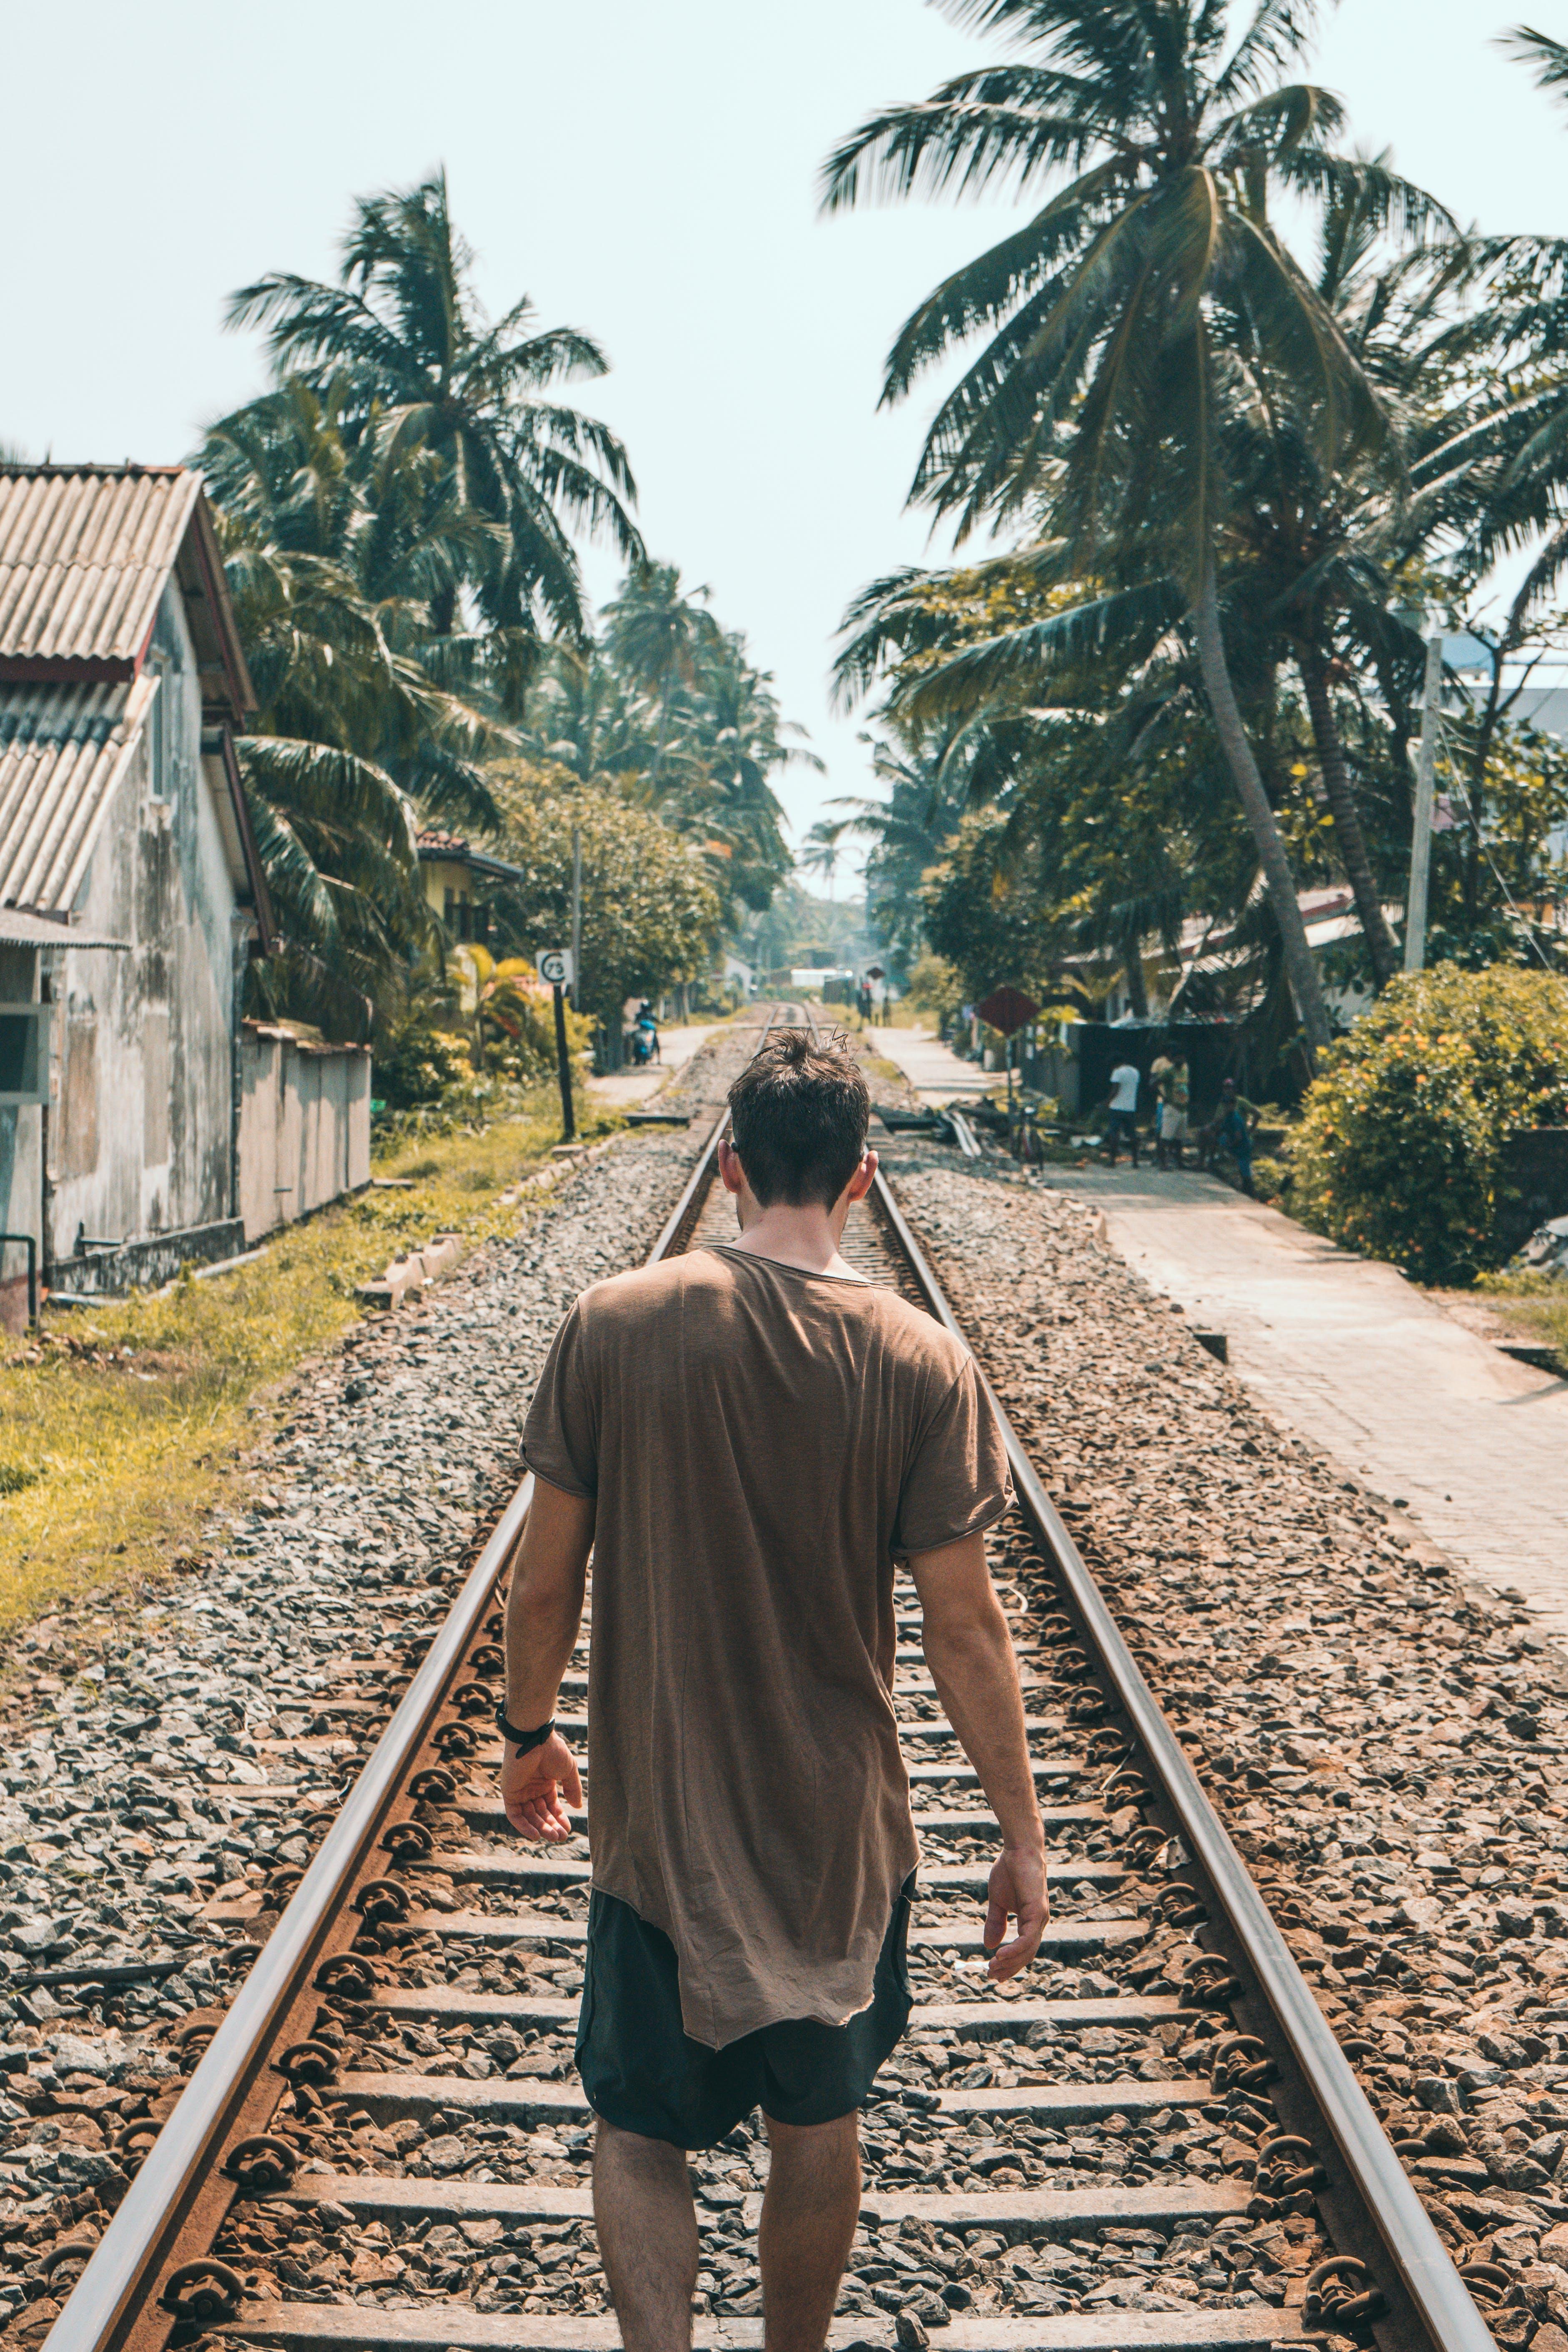 Man in Brown Shirt Standing on Train Rail Near Coconut Palms